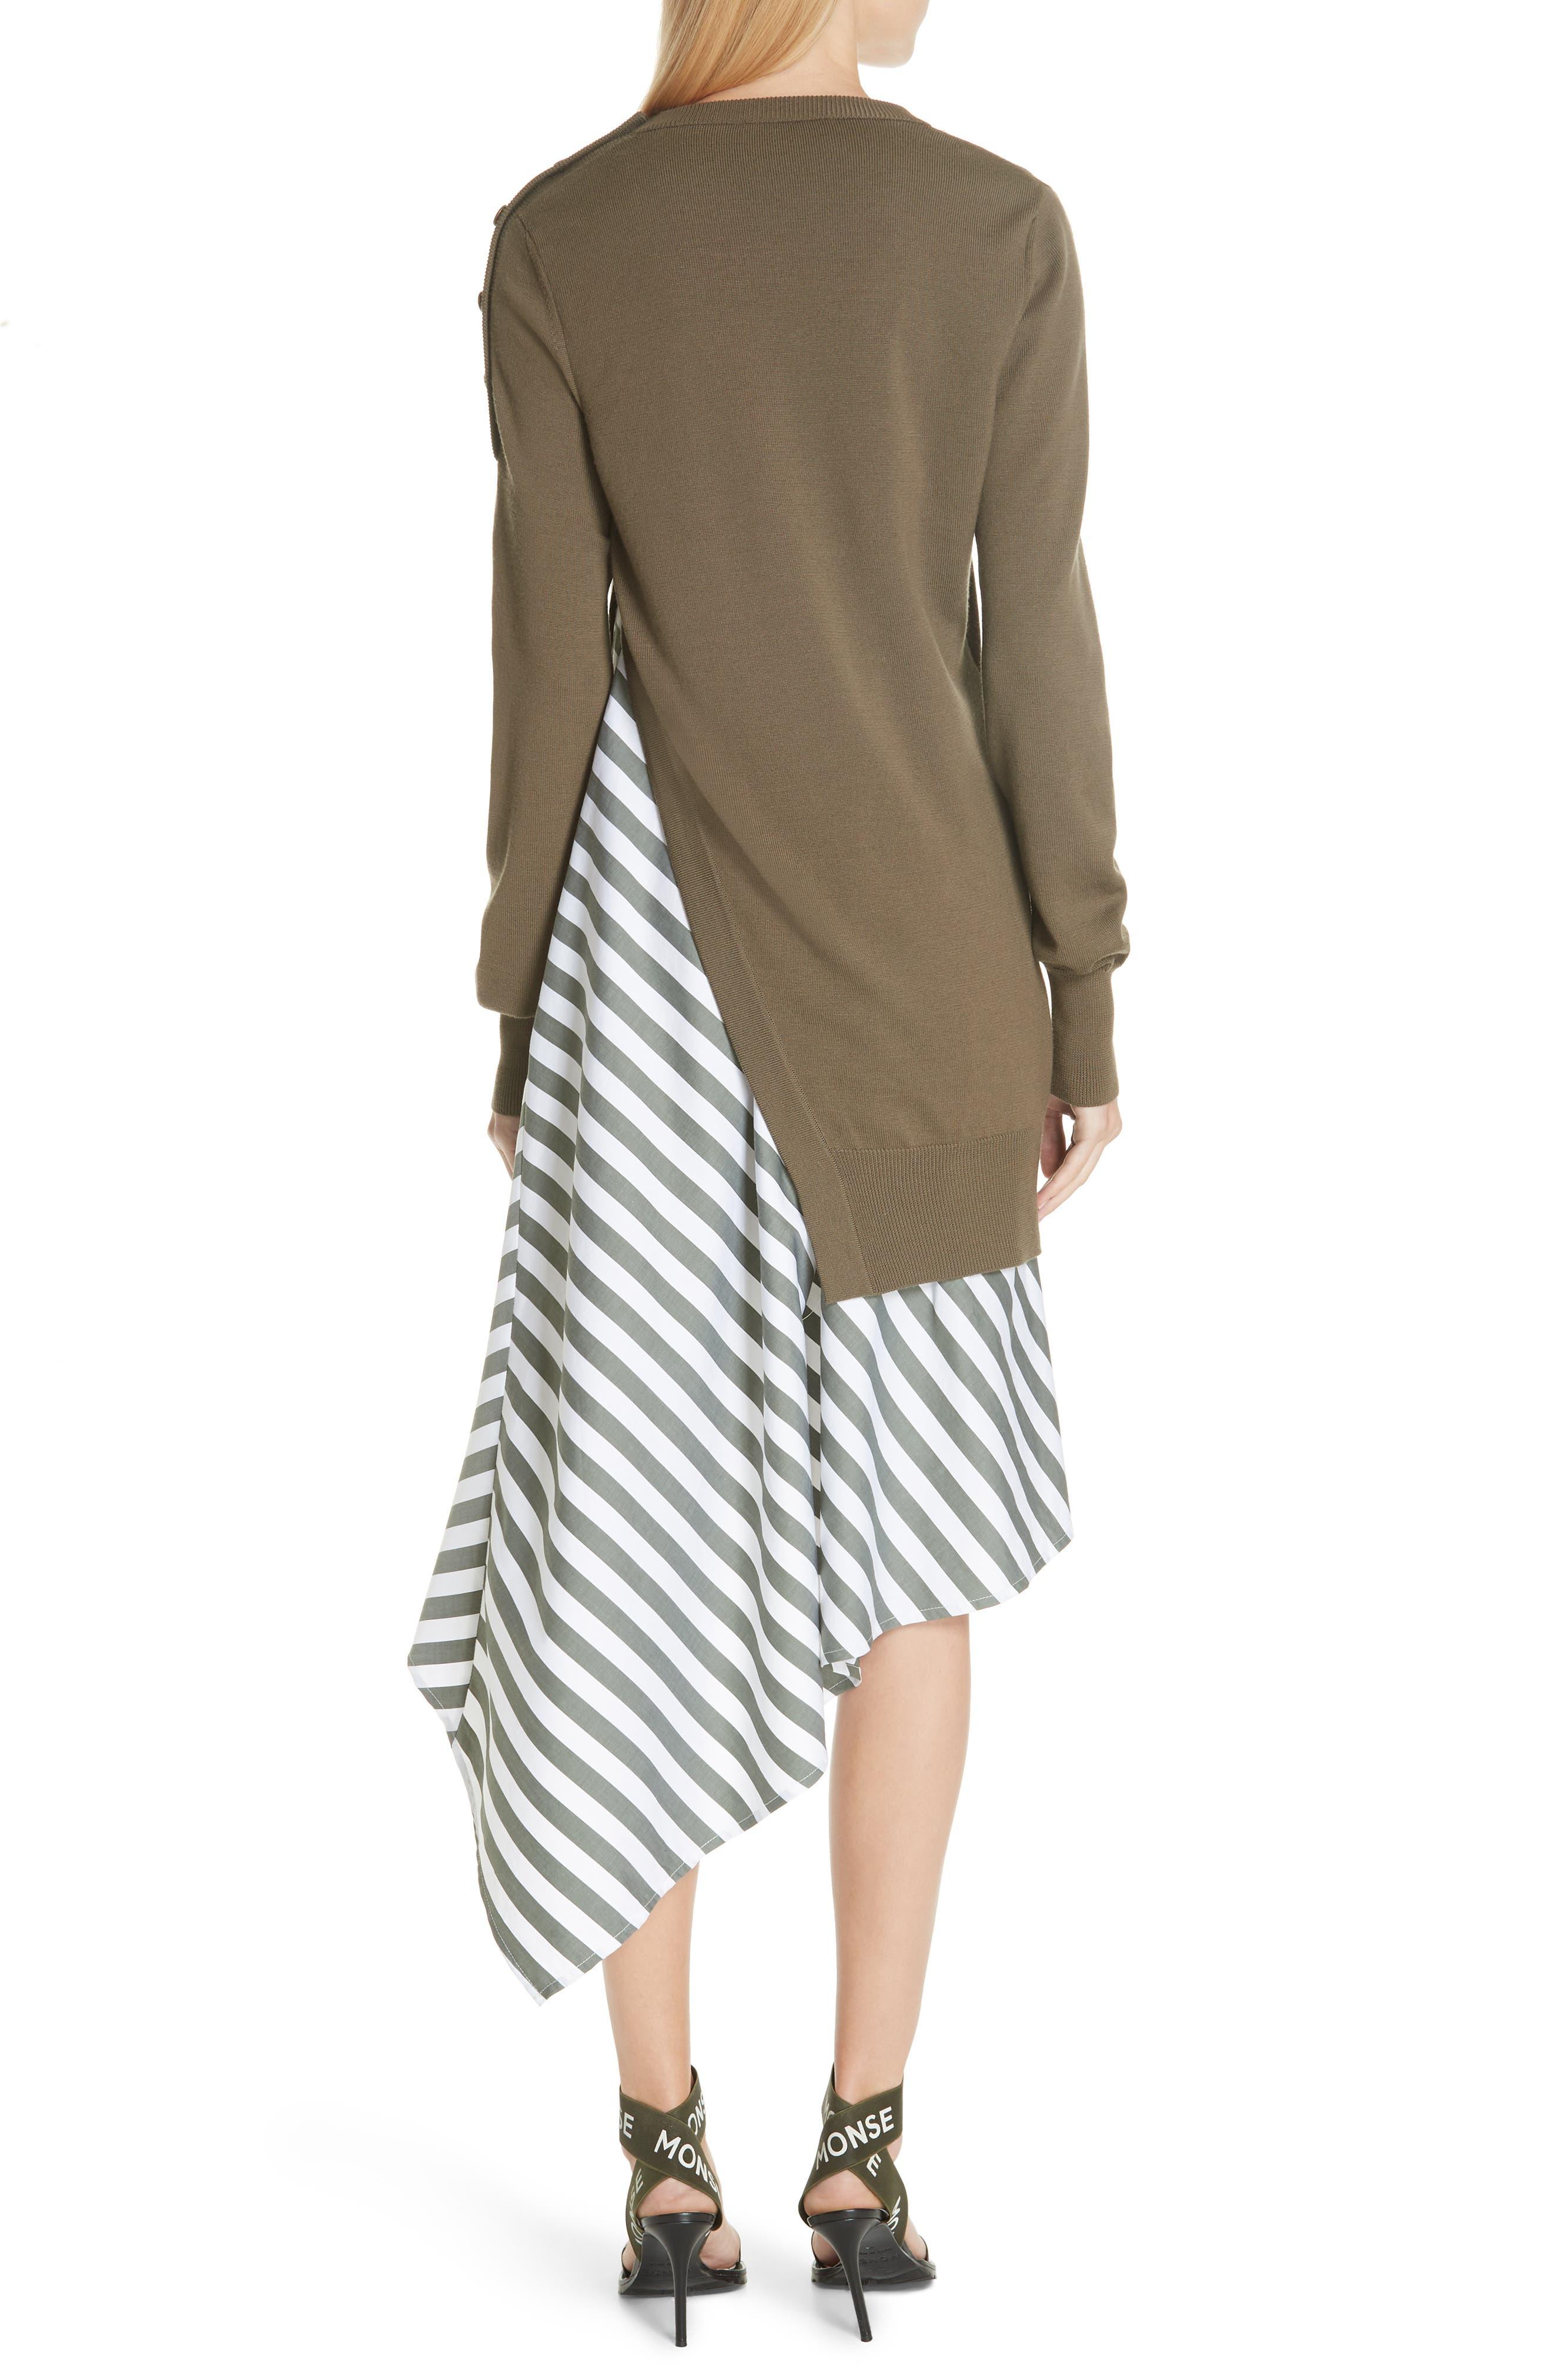 MONSE,                             Knit & Stripe Poplin Asymmetrical Dress,                             Alternate thumbnail 2, color,                             OLIVE/ WHITE